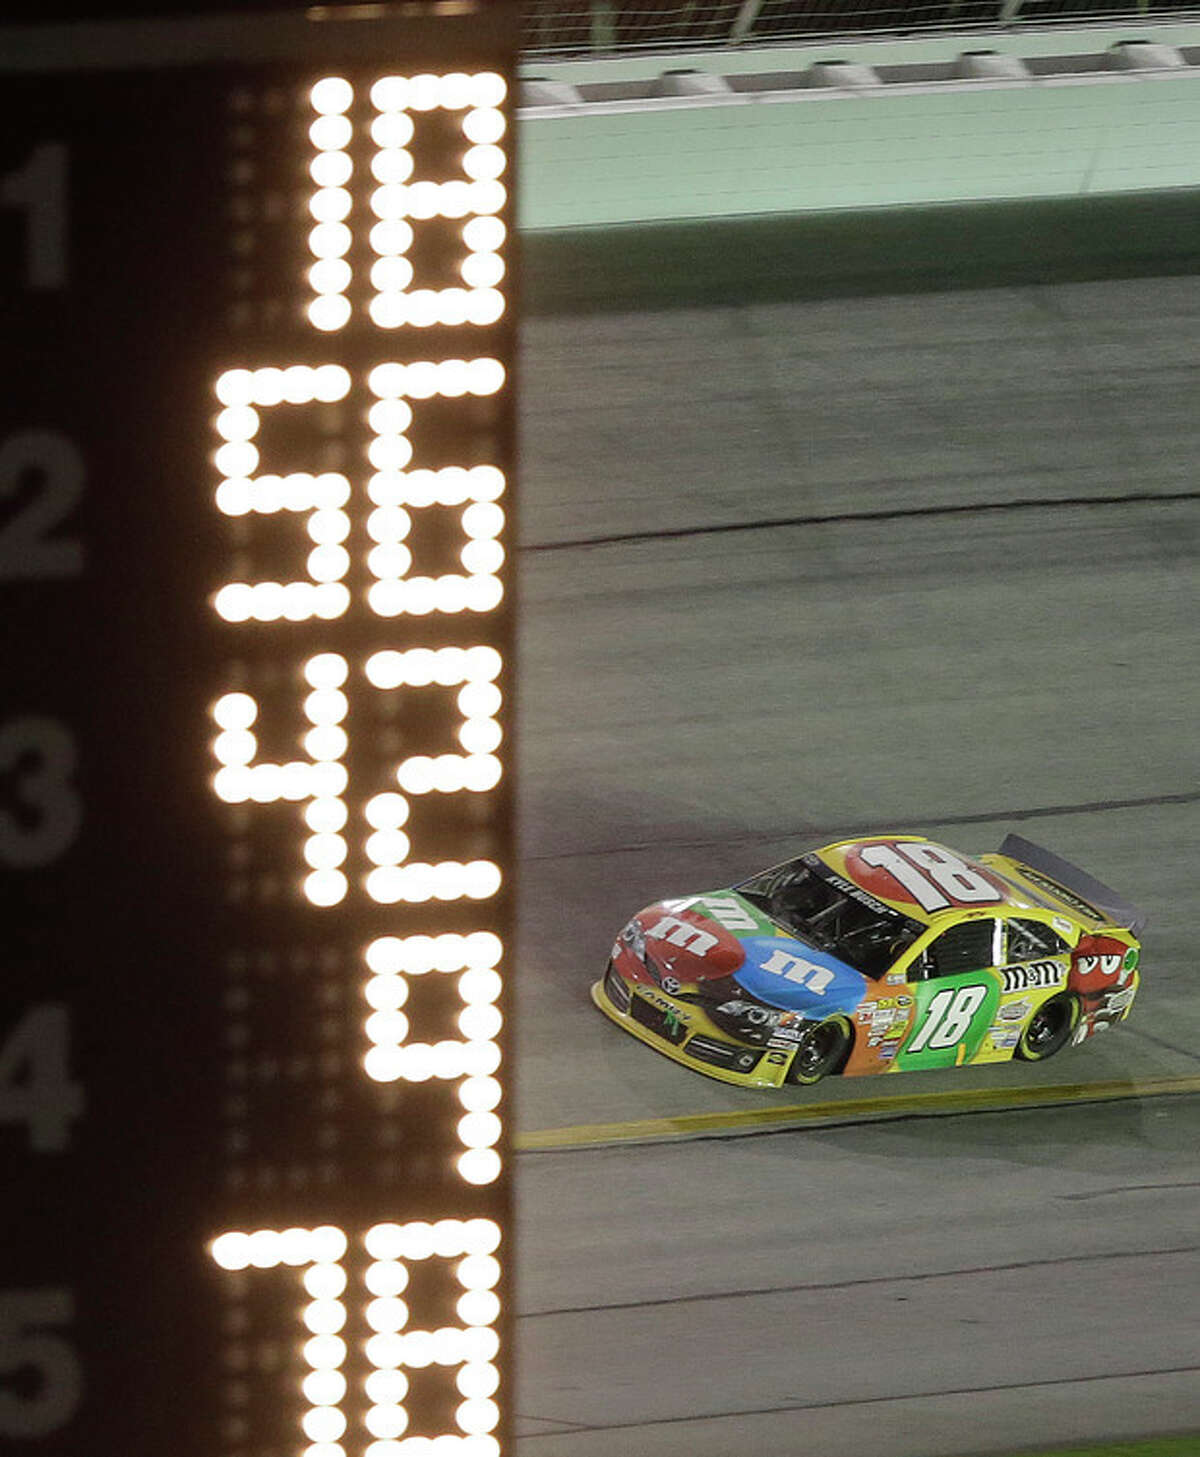 Sprint Cup Series driver Kyle Busch (18) drives through turn 4 during the NASCAR Sprint Cup Series auto race at Atlanta Motor Speedway in Hampton, Ga., Sunday, Sept. 1, 2013. Busch won the race. (AP Photo/John Bazemore)